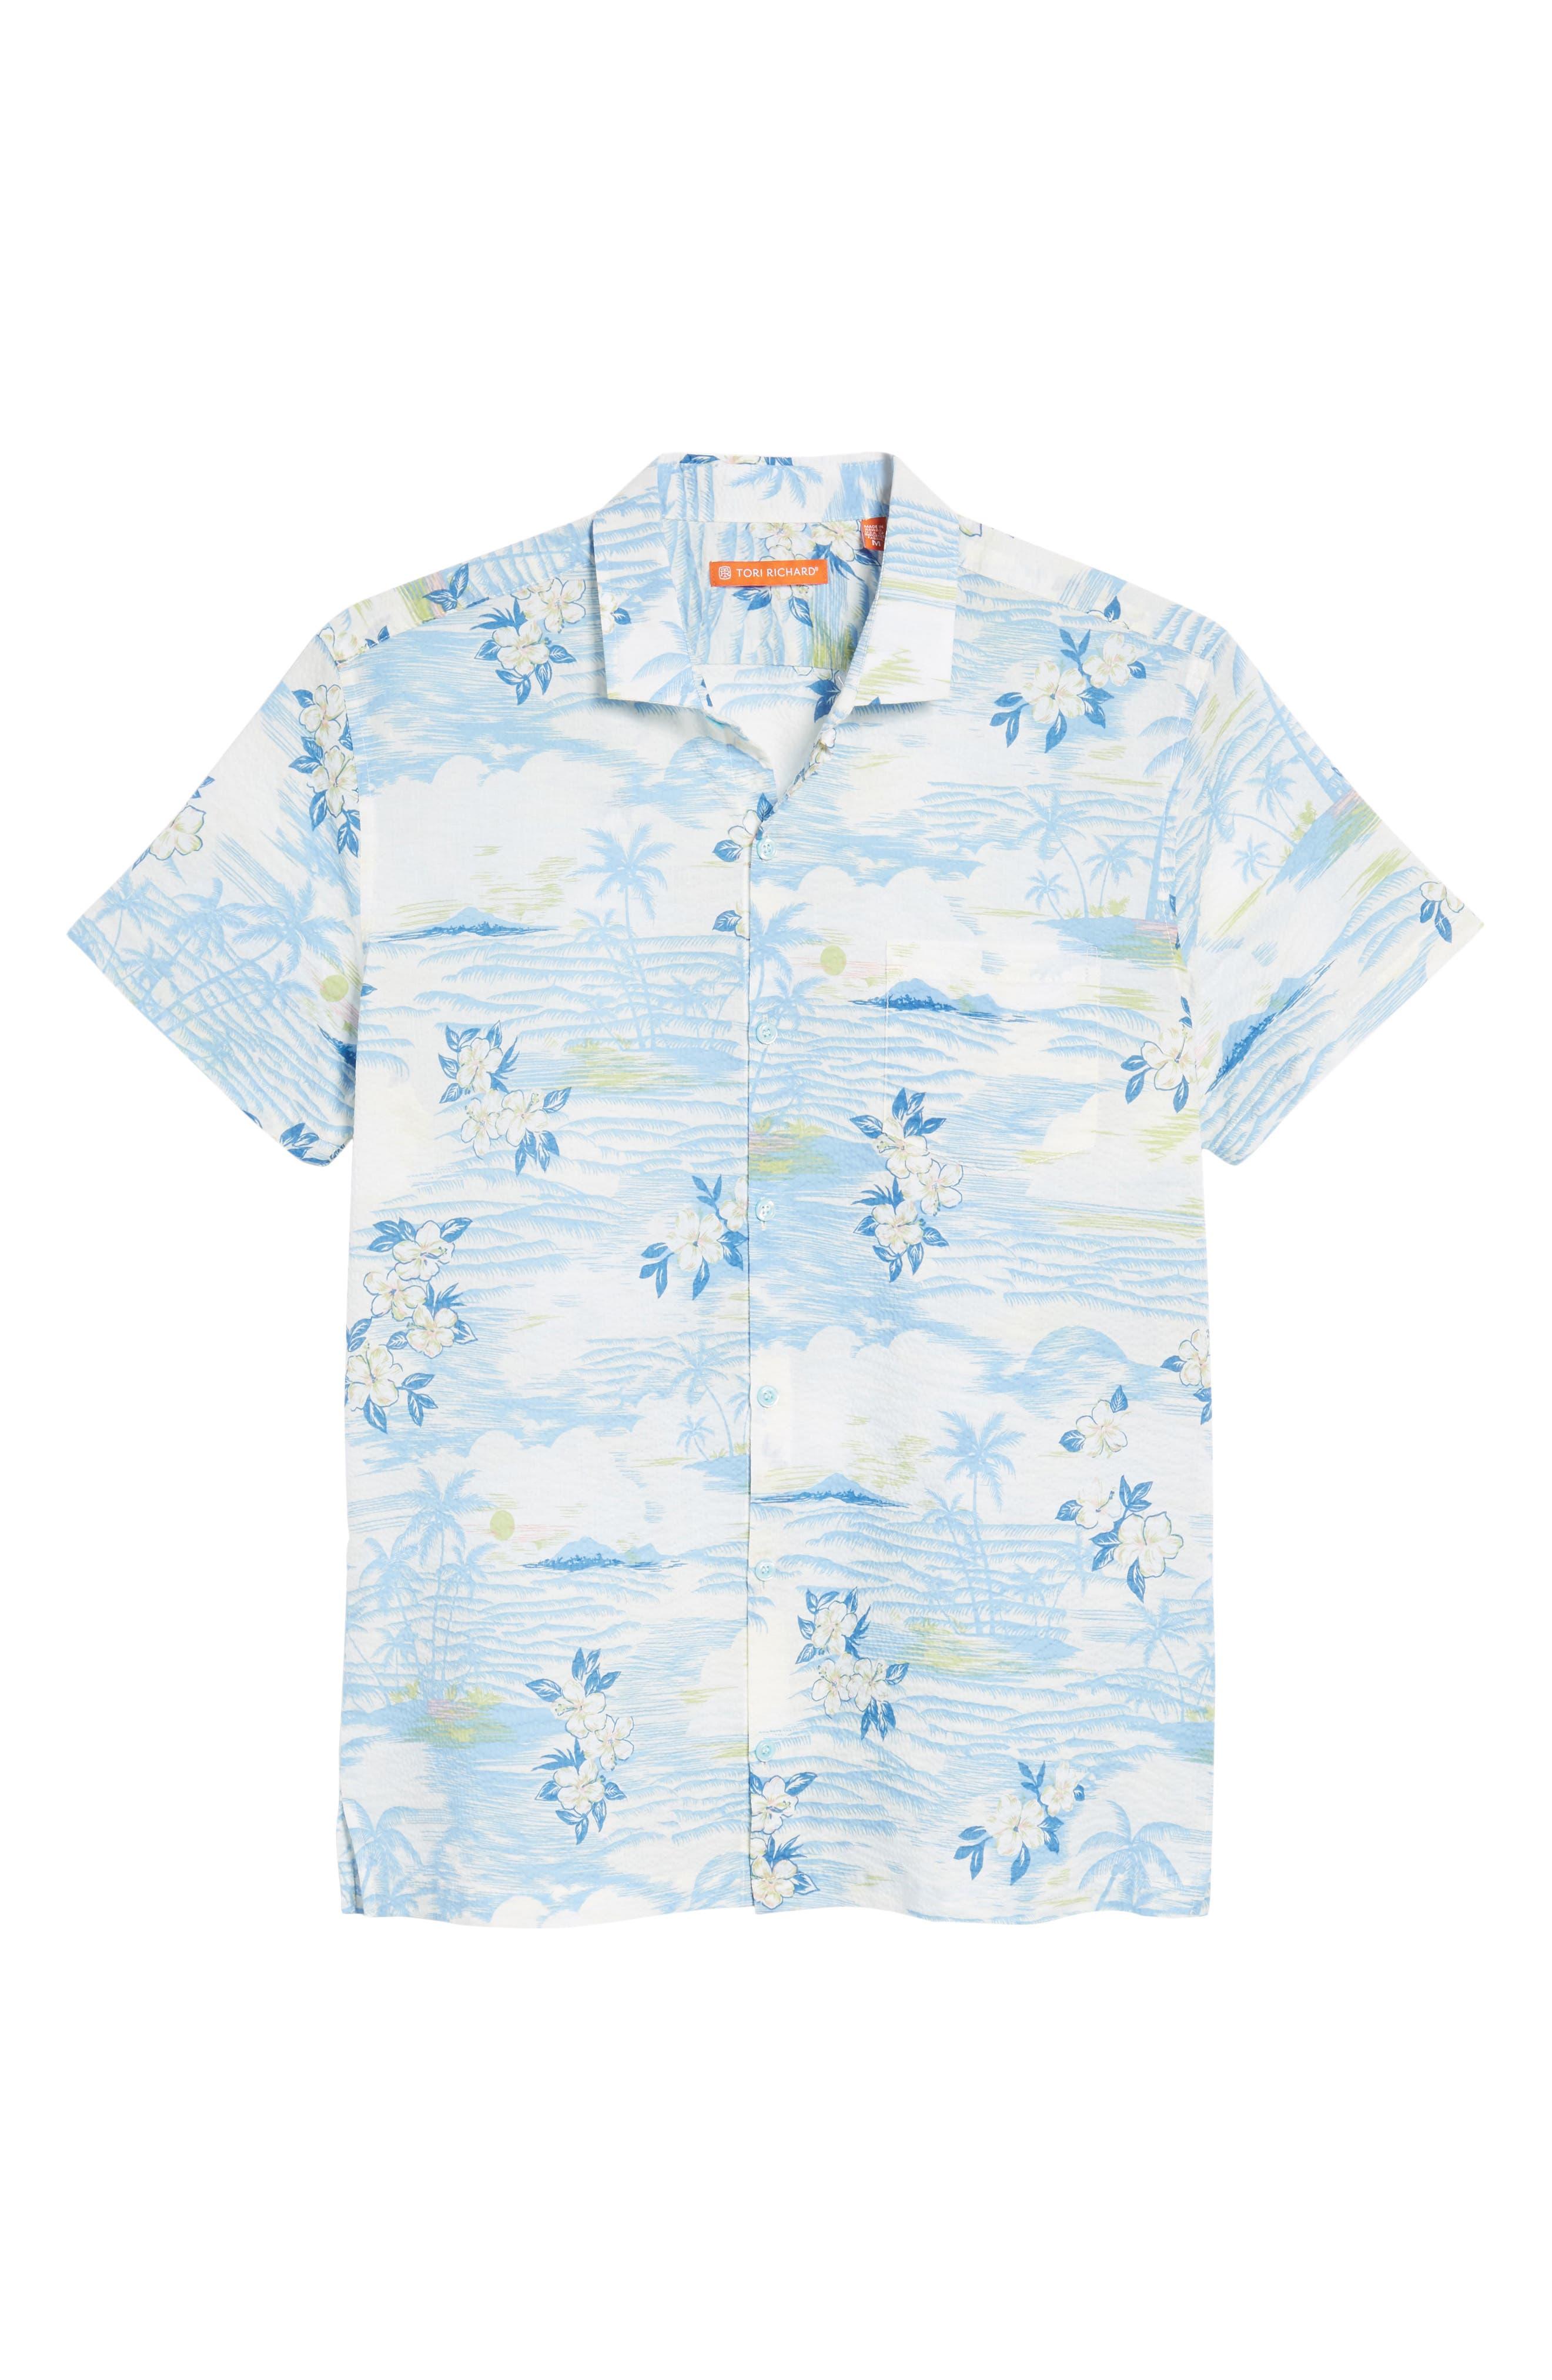 Tropic Dream Lawn Sport Shirt,                             Alternate thumbnail 6, color,                             409